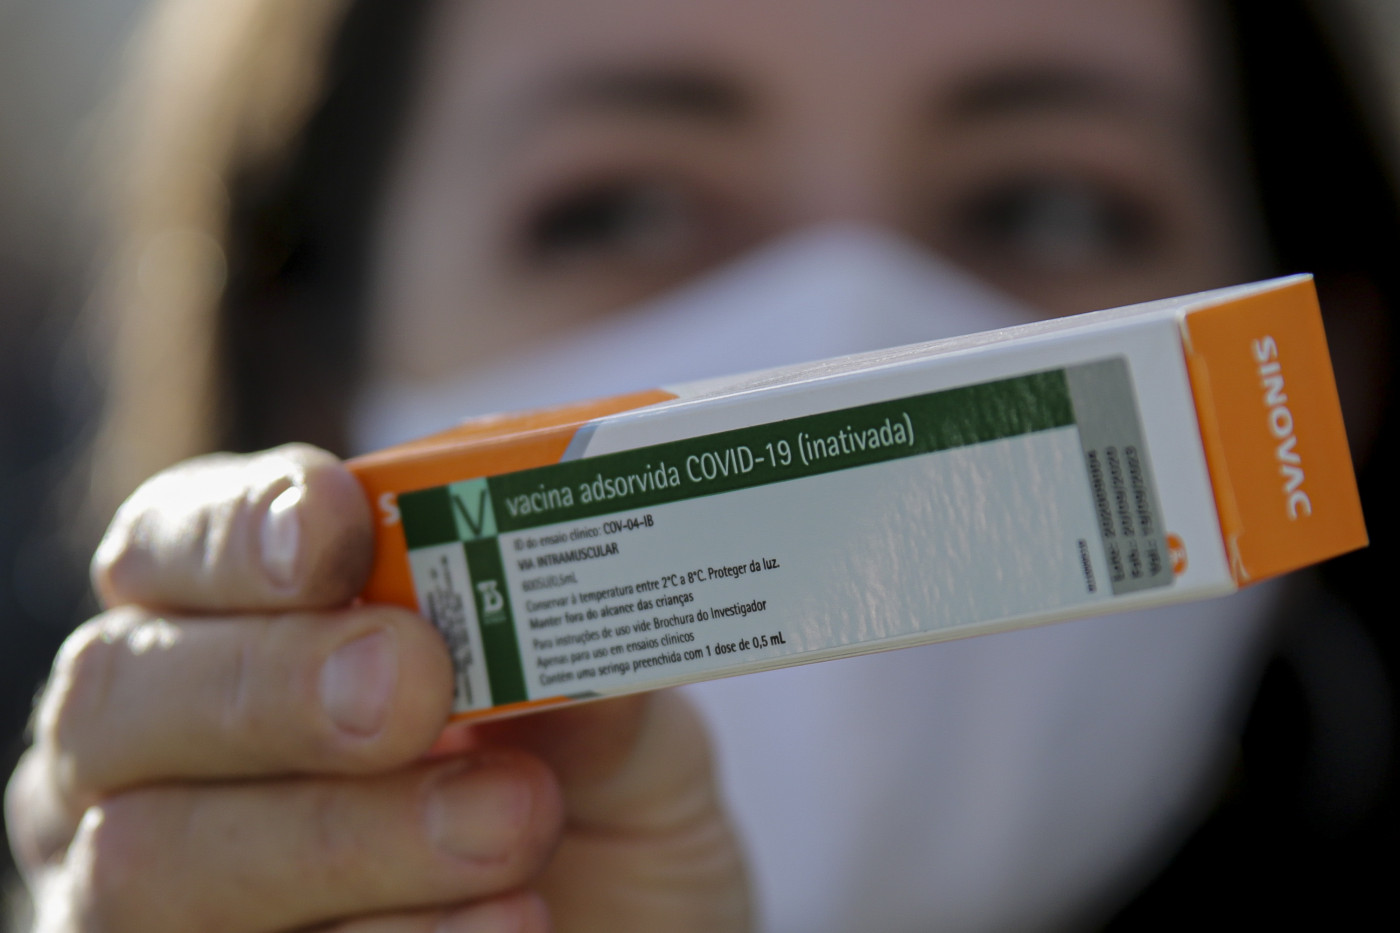 A CoronaVac é a vacina contra a Covid-19 produzida pelo Instituto Butantan